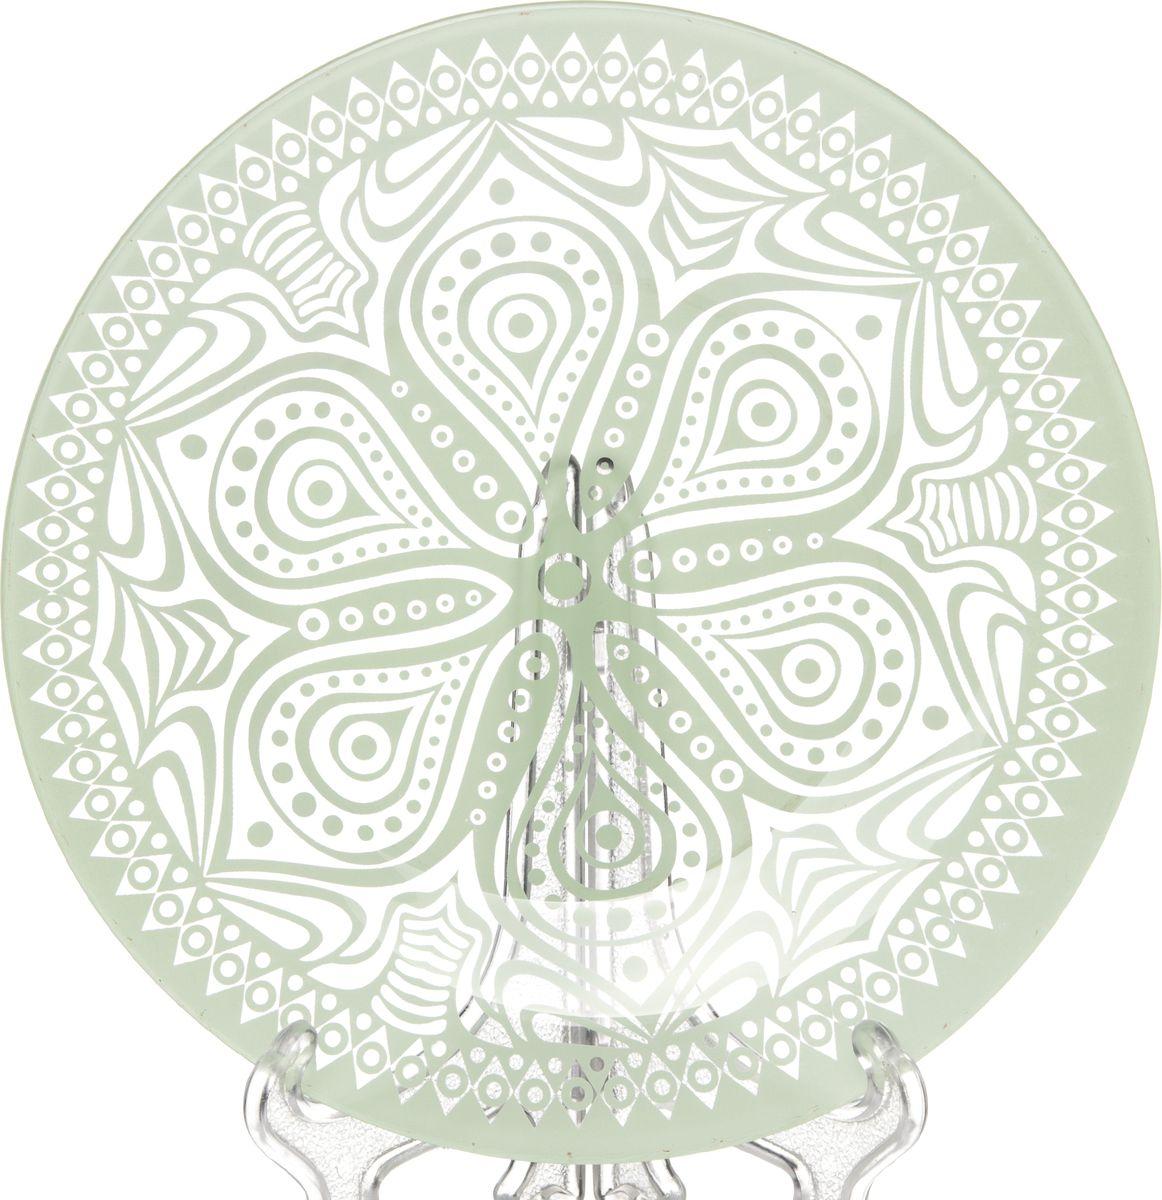 Тарелка Pasabahce Бохо, цвет: зеленый, диаметр 19,5 см тарелка pasabahce атлантис цвет прозрачный диаметр 21 см